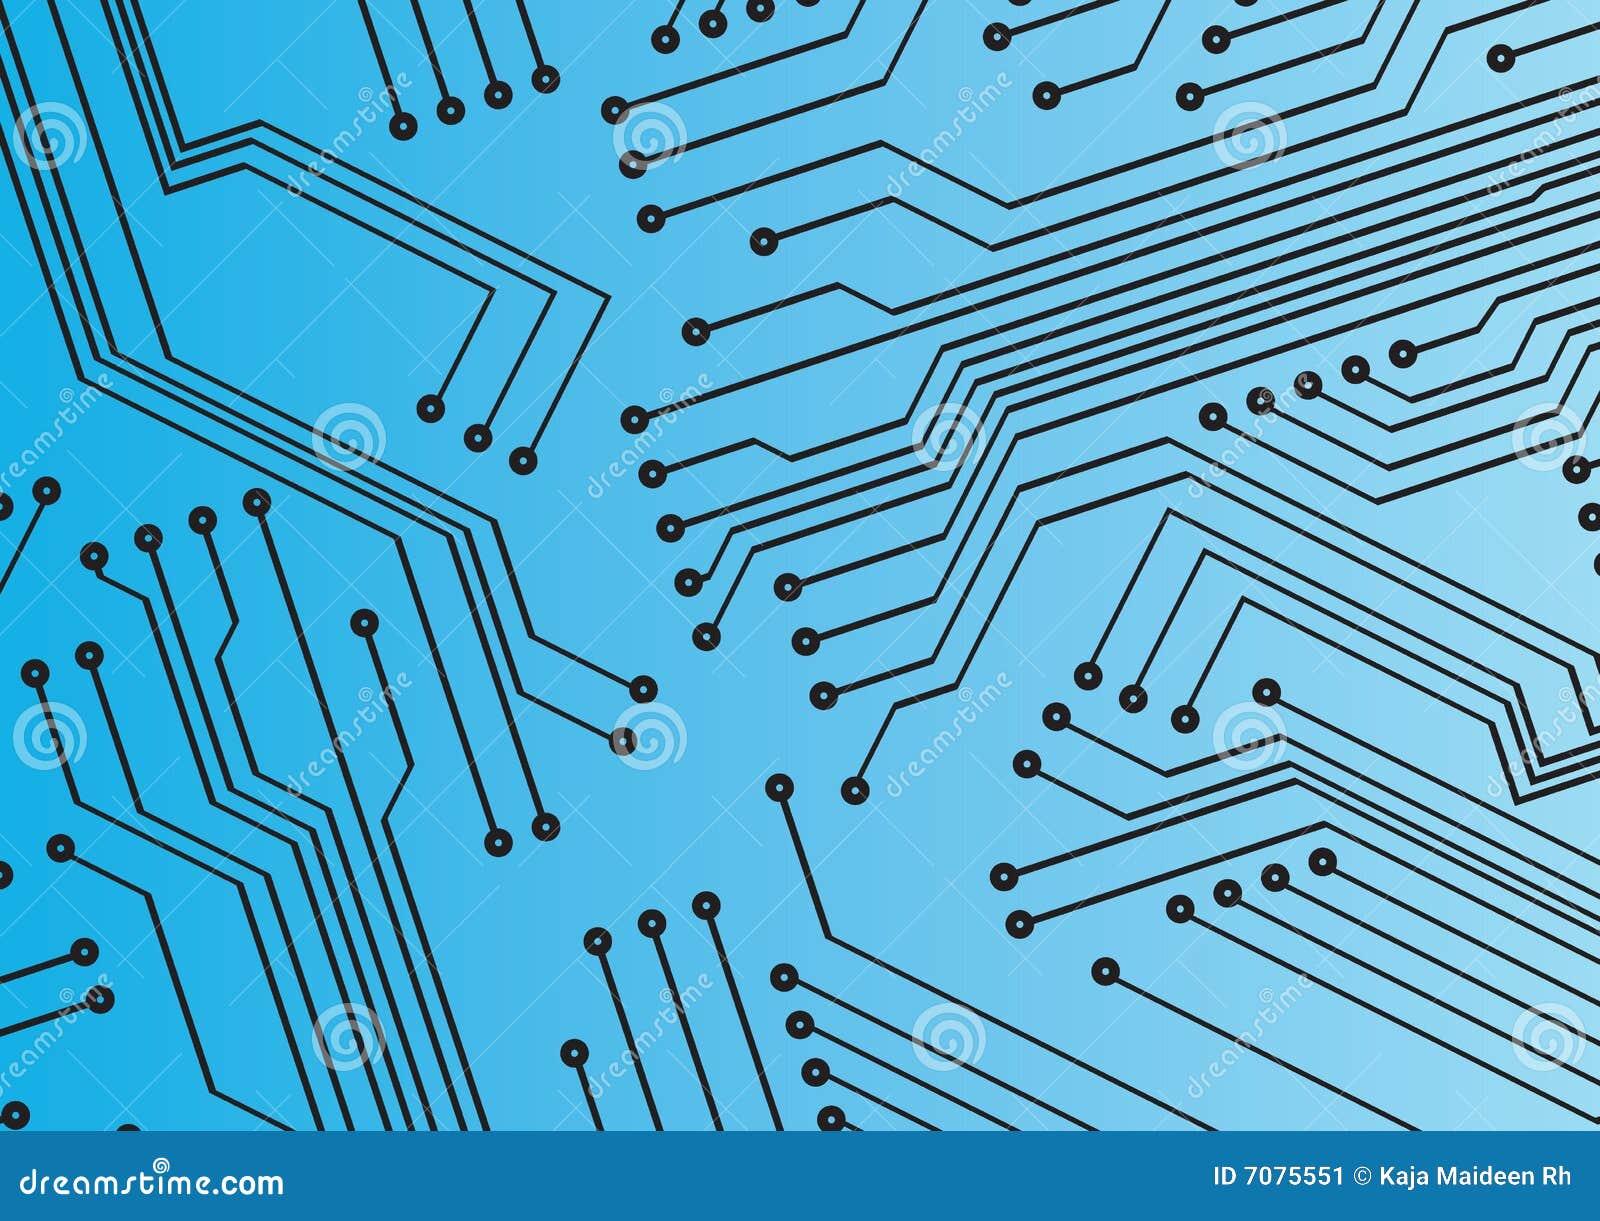 Circuit background stock illustration. Illustration of lines - 7075551